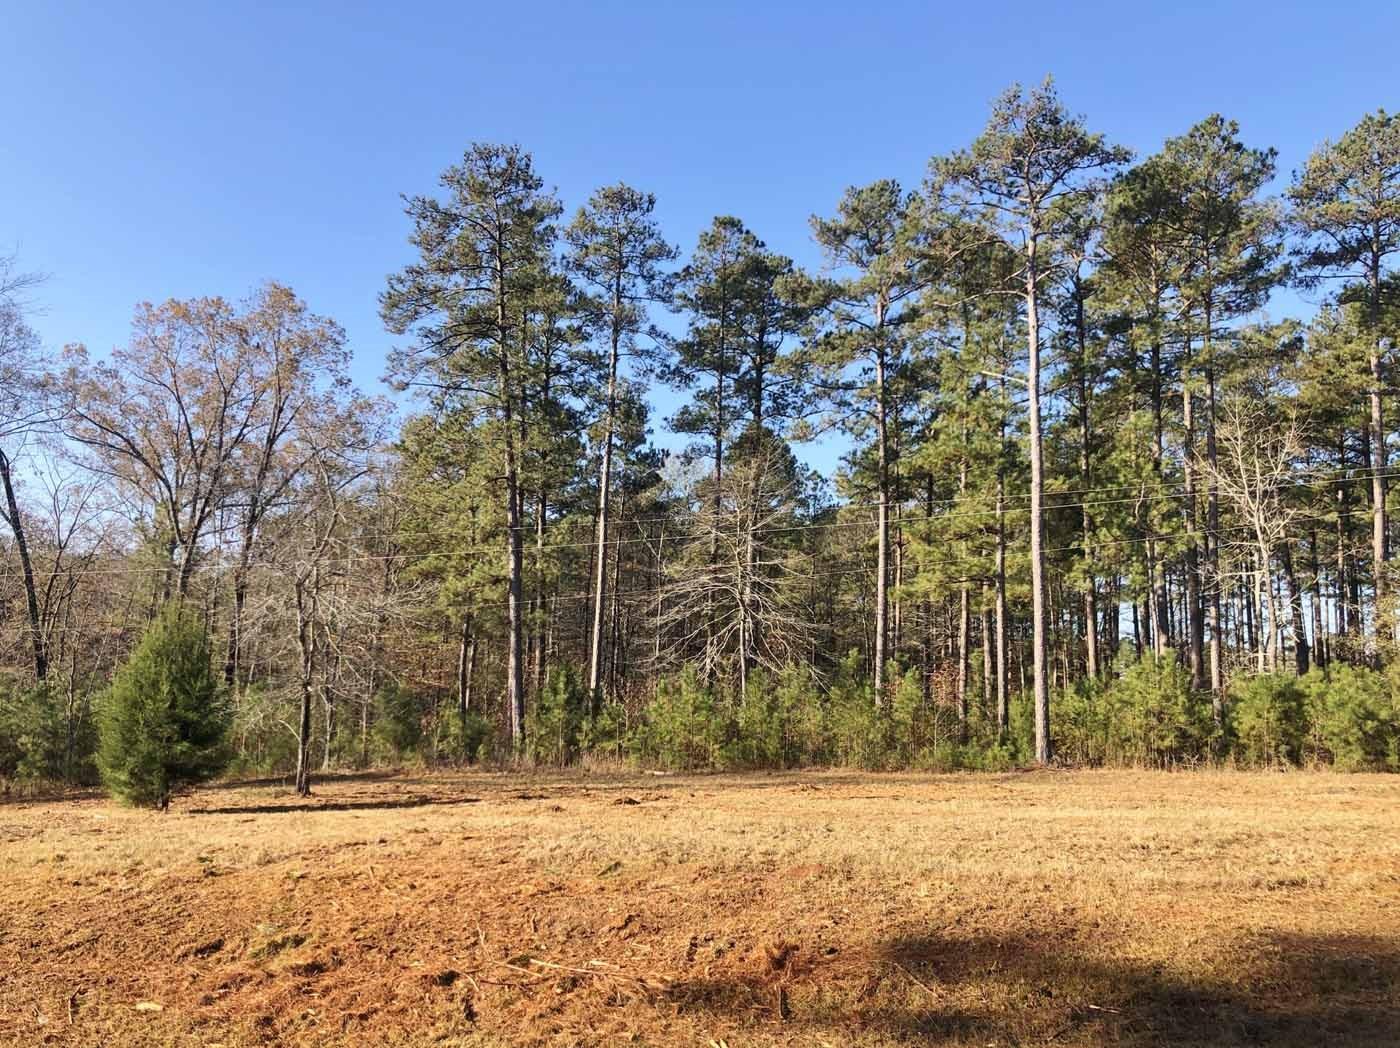 5.55 Acres Land for Sale - Country Estate, Ruston, LA